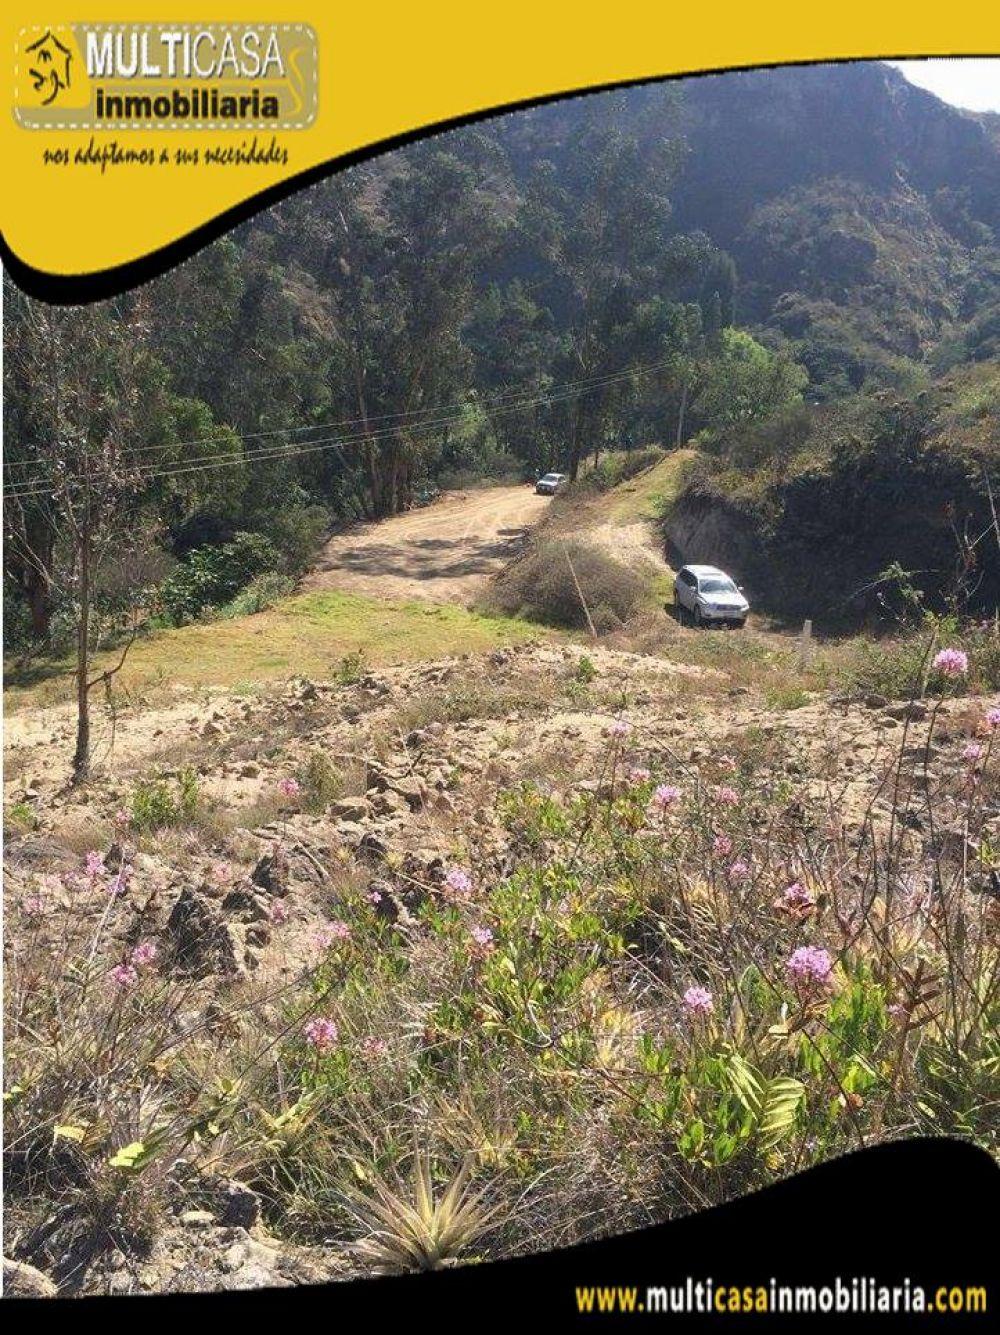 Sitio en Venta con Línea de fábrica a Crédito Sector Challuabamba Cuenca-Ecuador